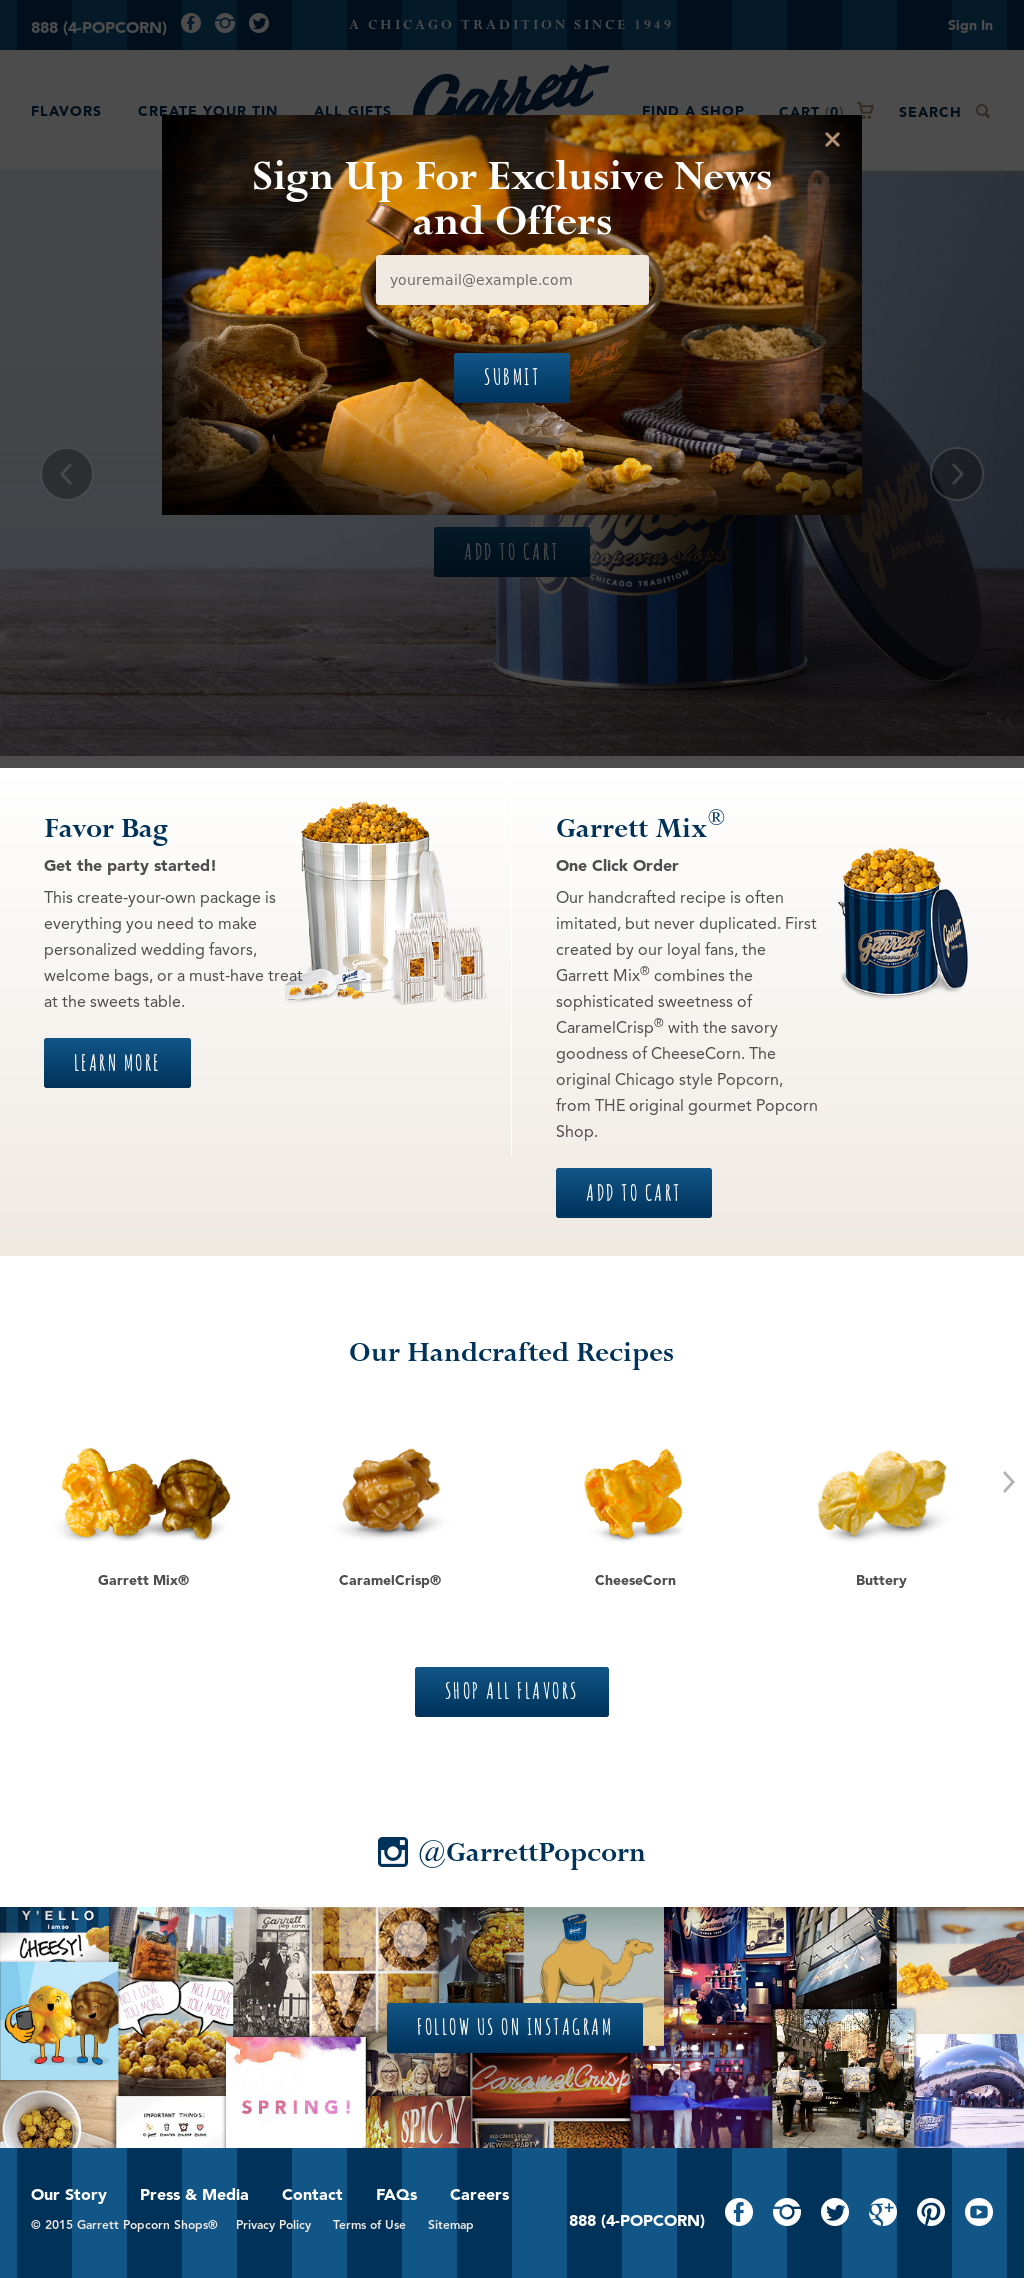 Garrett Popcorn Shop Competitors, Revenue and Employees